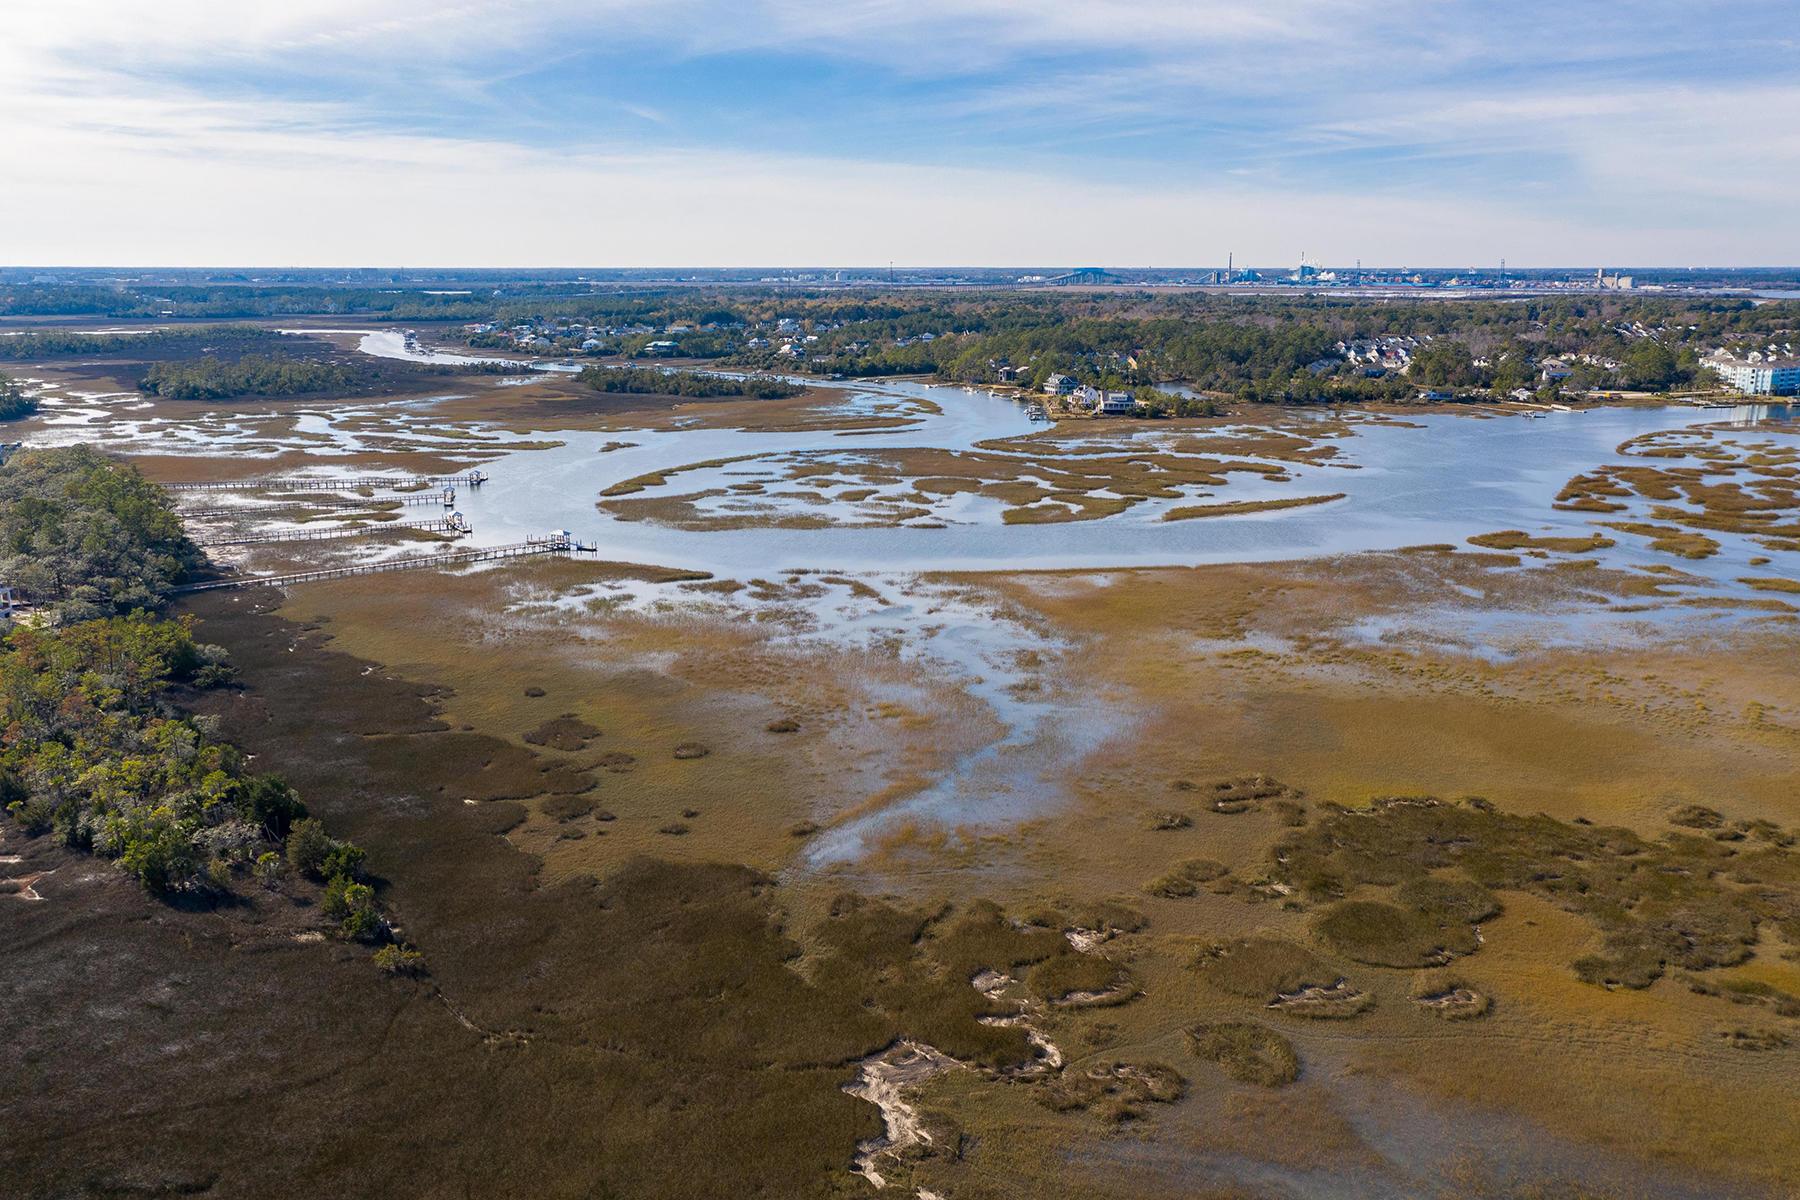 Daniel Island Park Homes For Sale - 555 Lesesne, Charleston, SC - 0